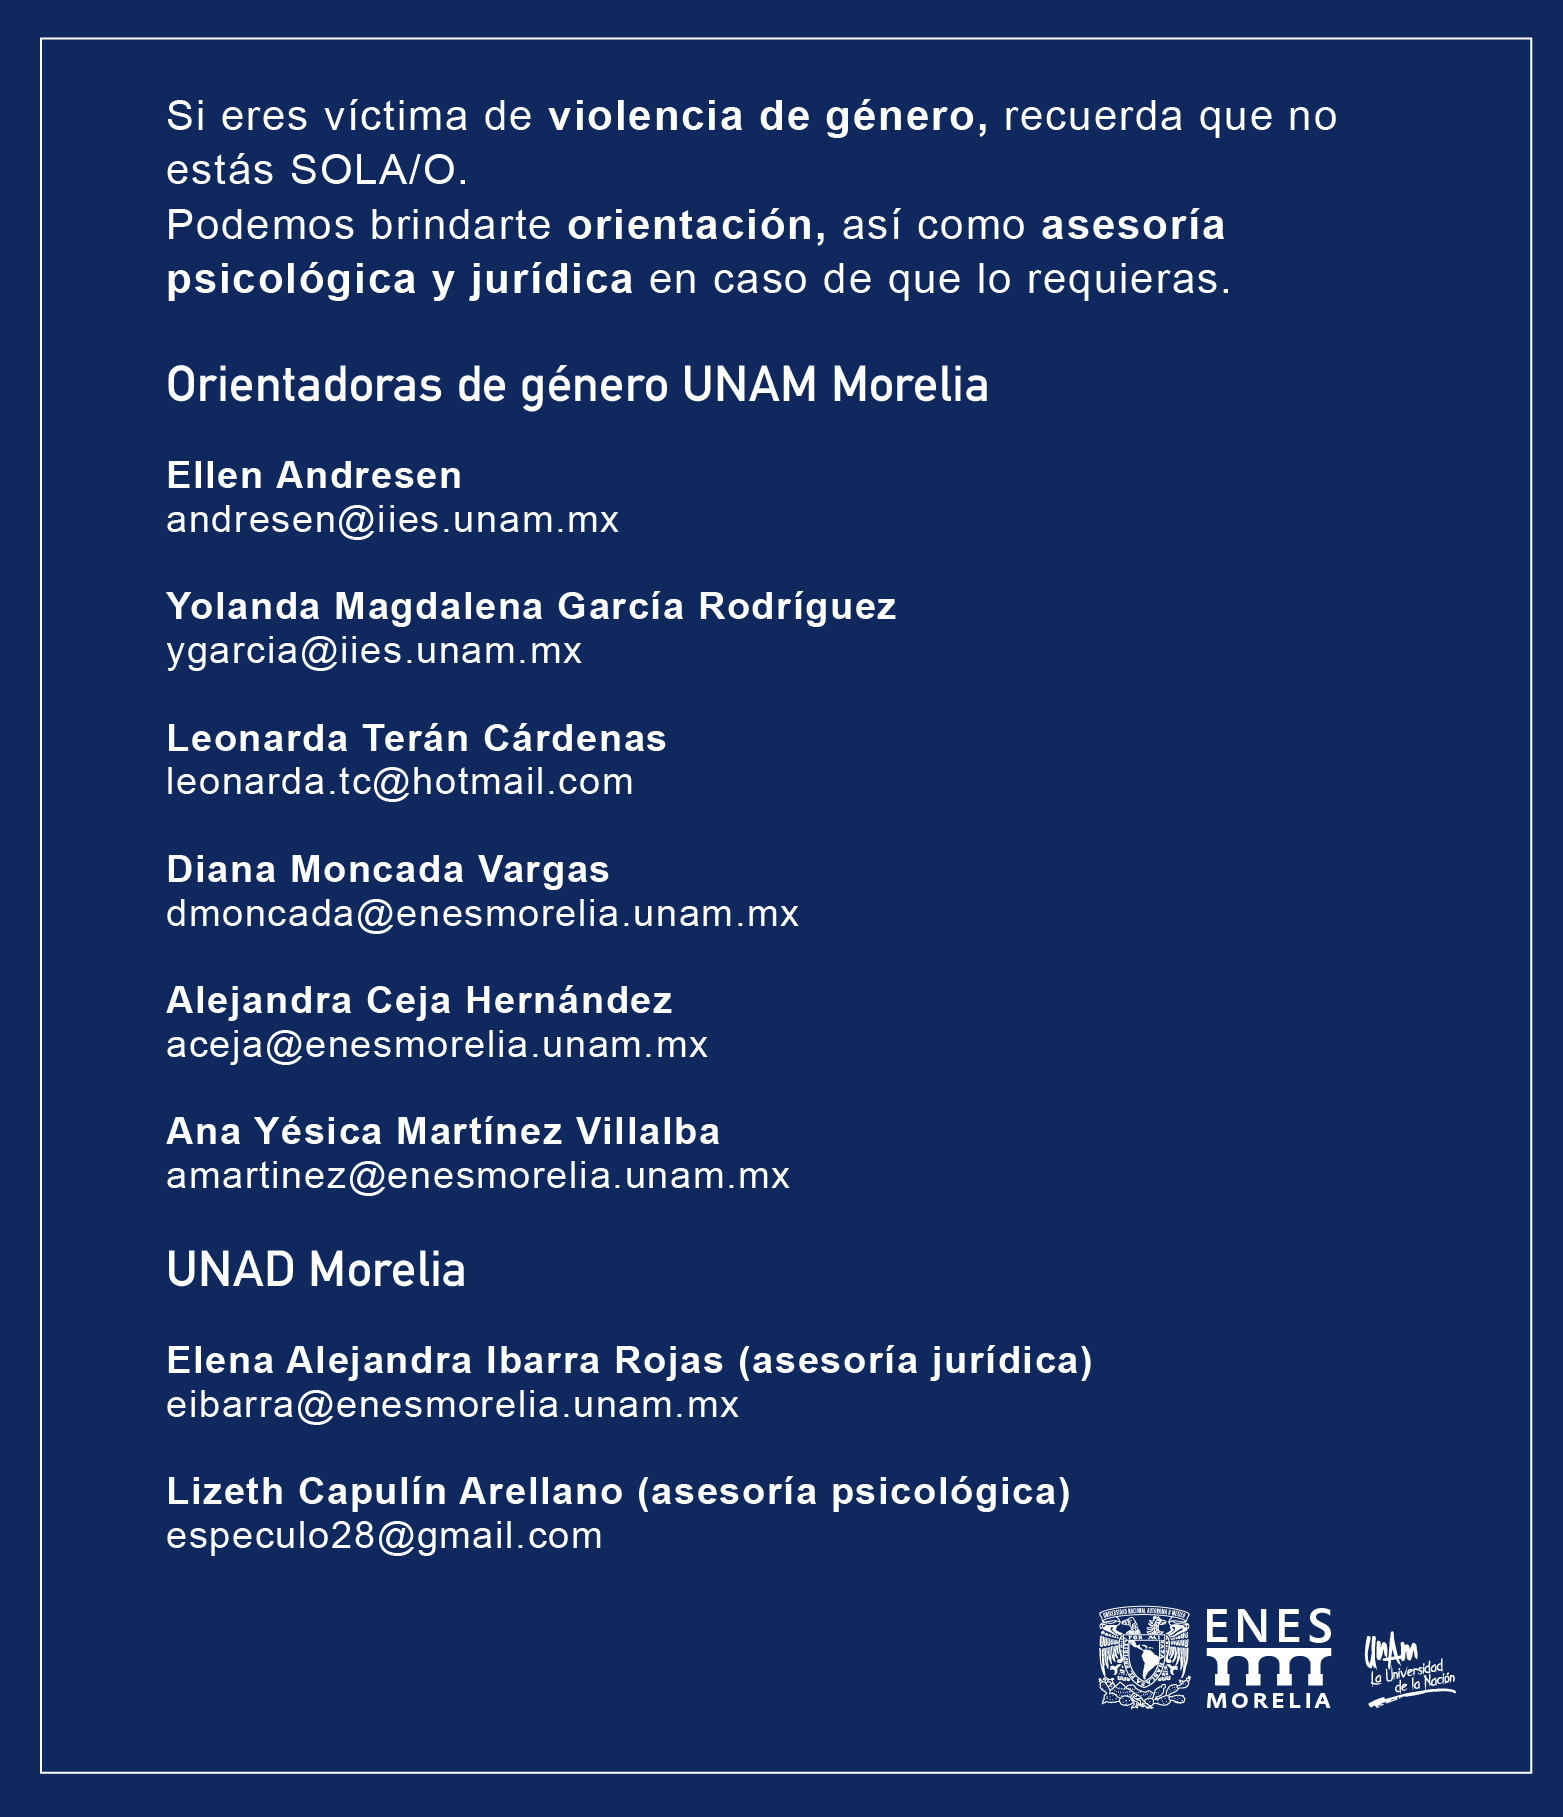 UNAM Morelia3-03